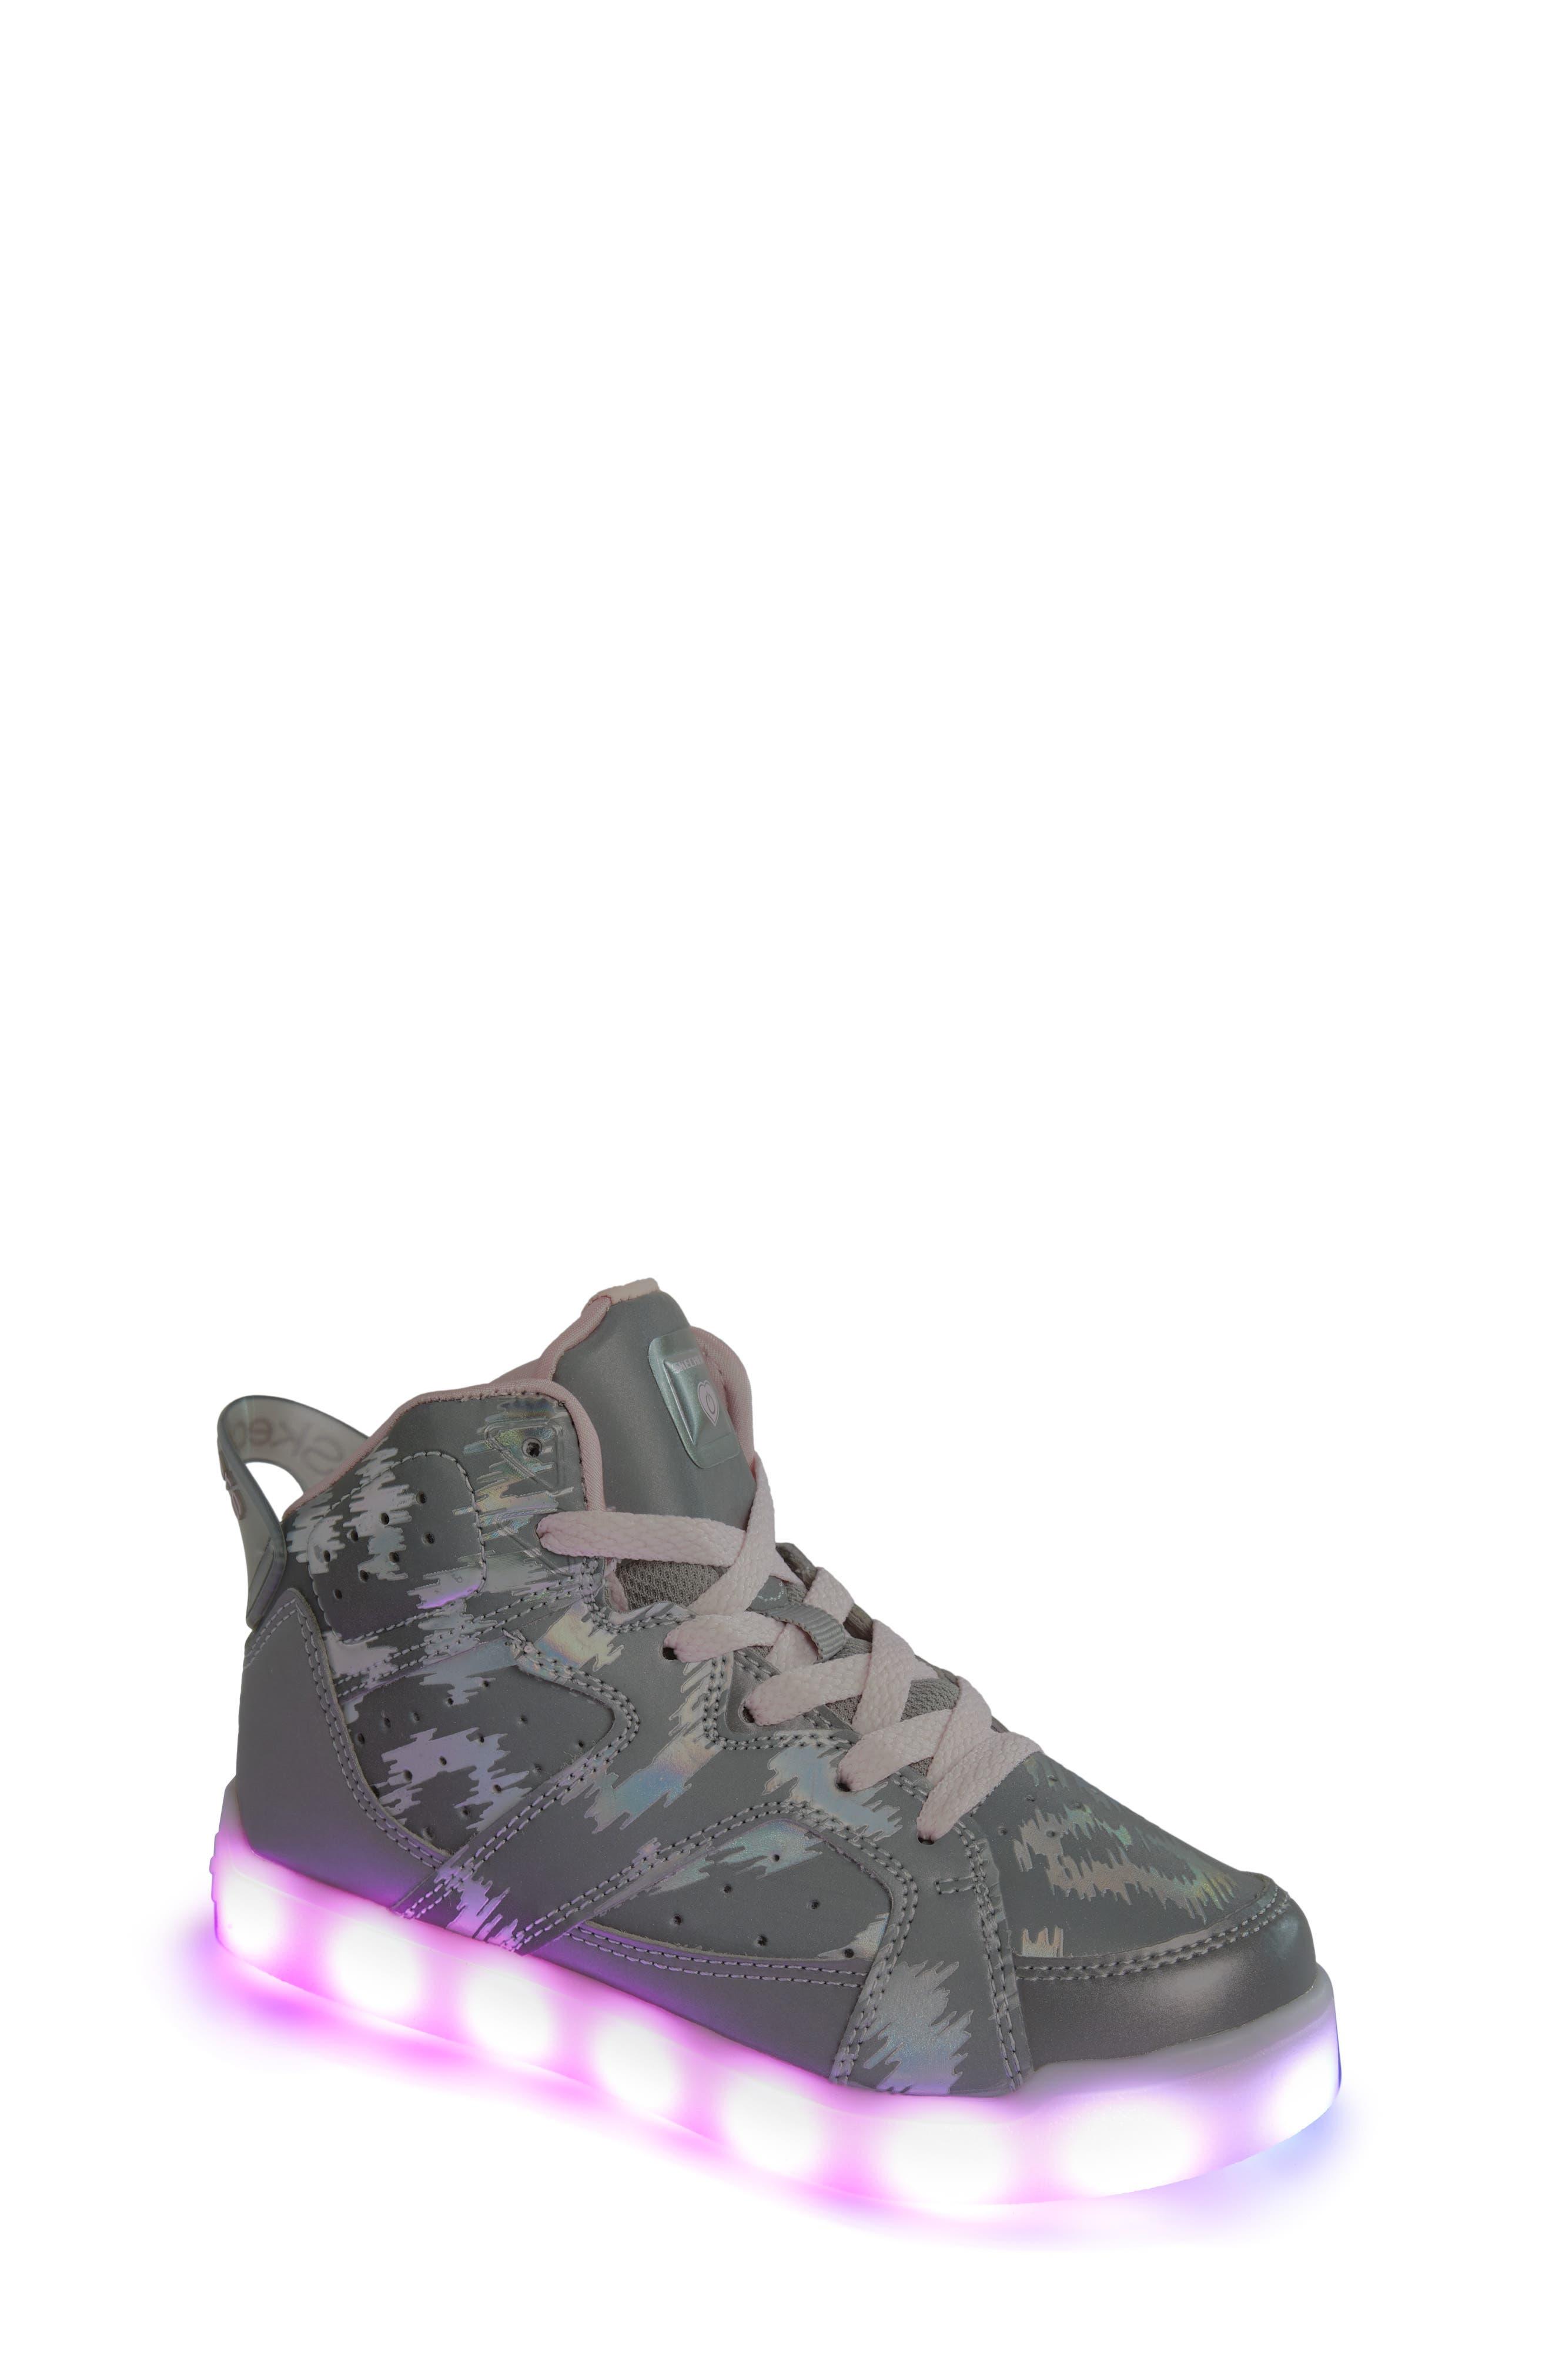 Energy Lights Pro Reflecti-Fab Sneaker,                             Alternate thumbnail 7, color,                             SILVER